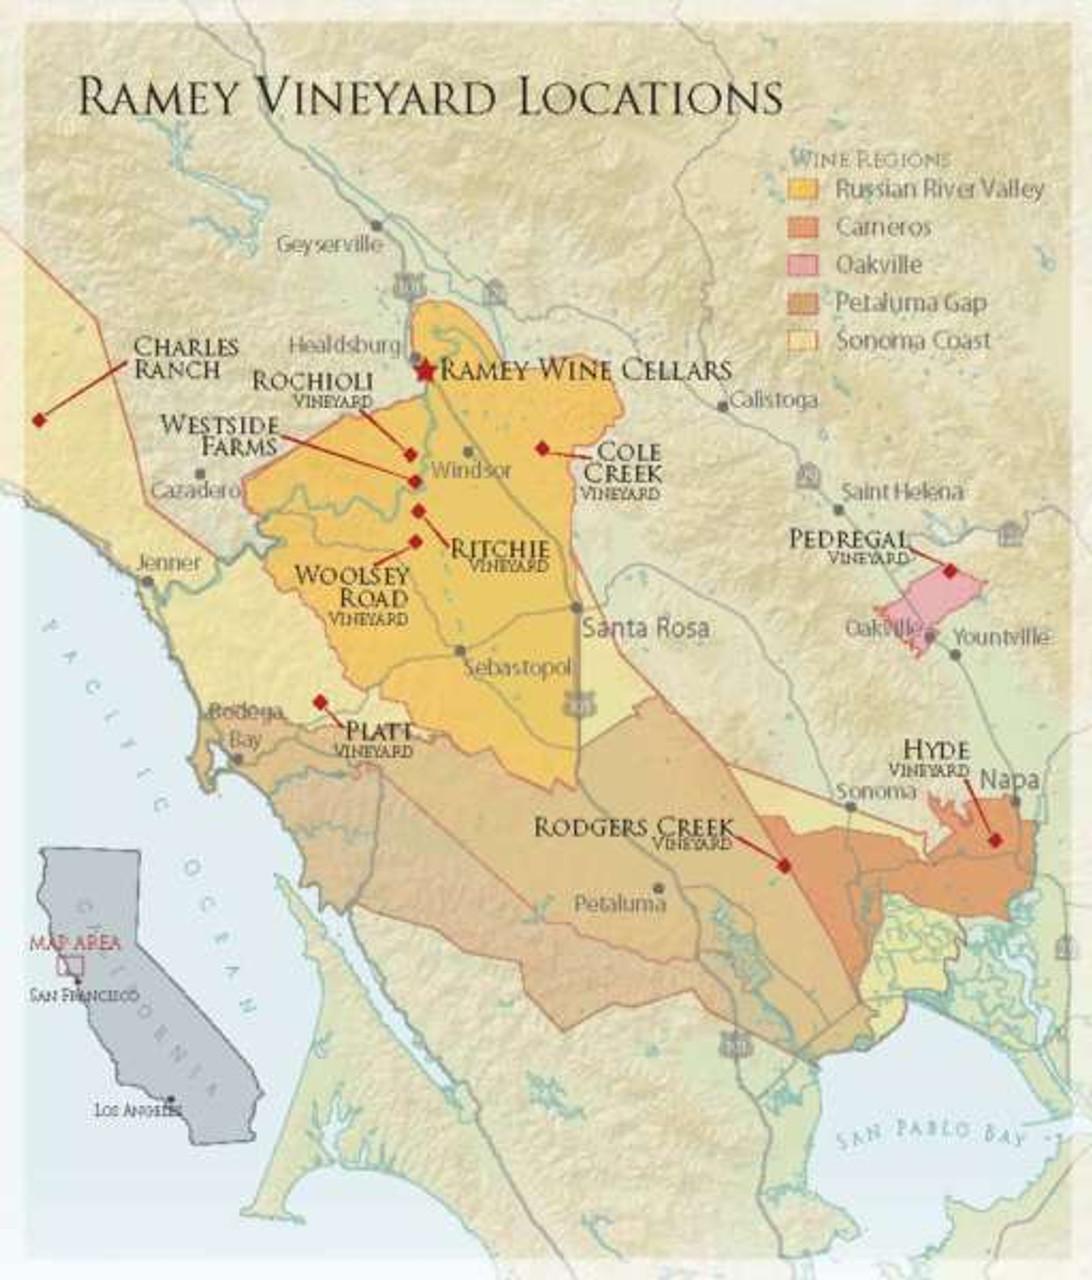 Ramey Vineyard Map